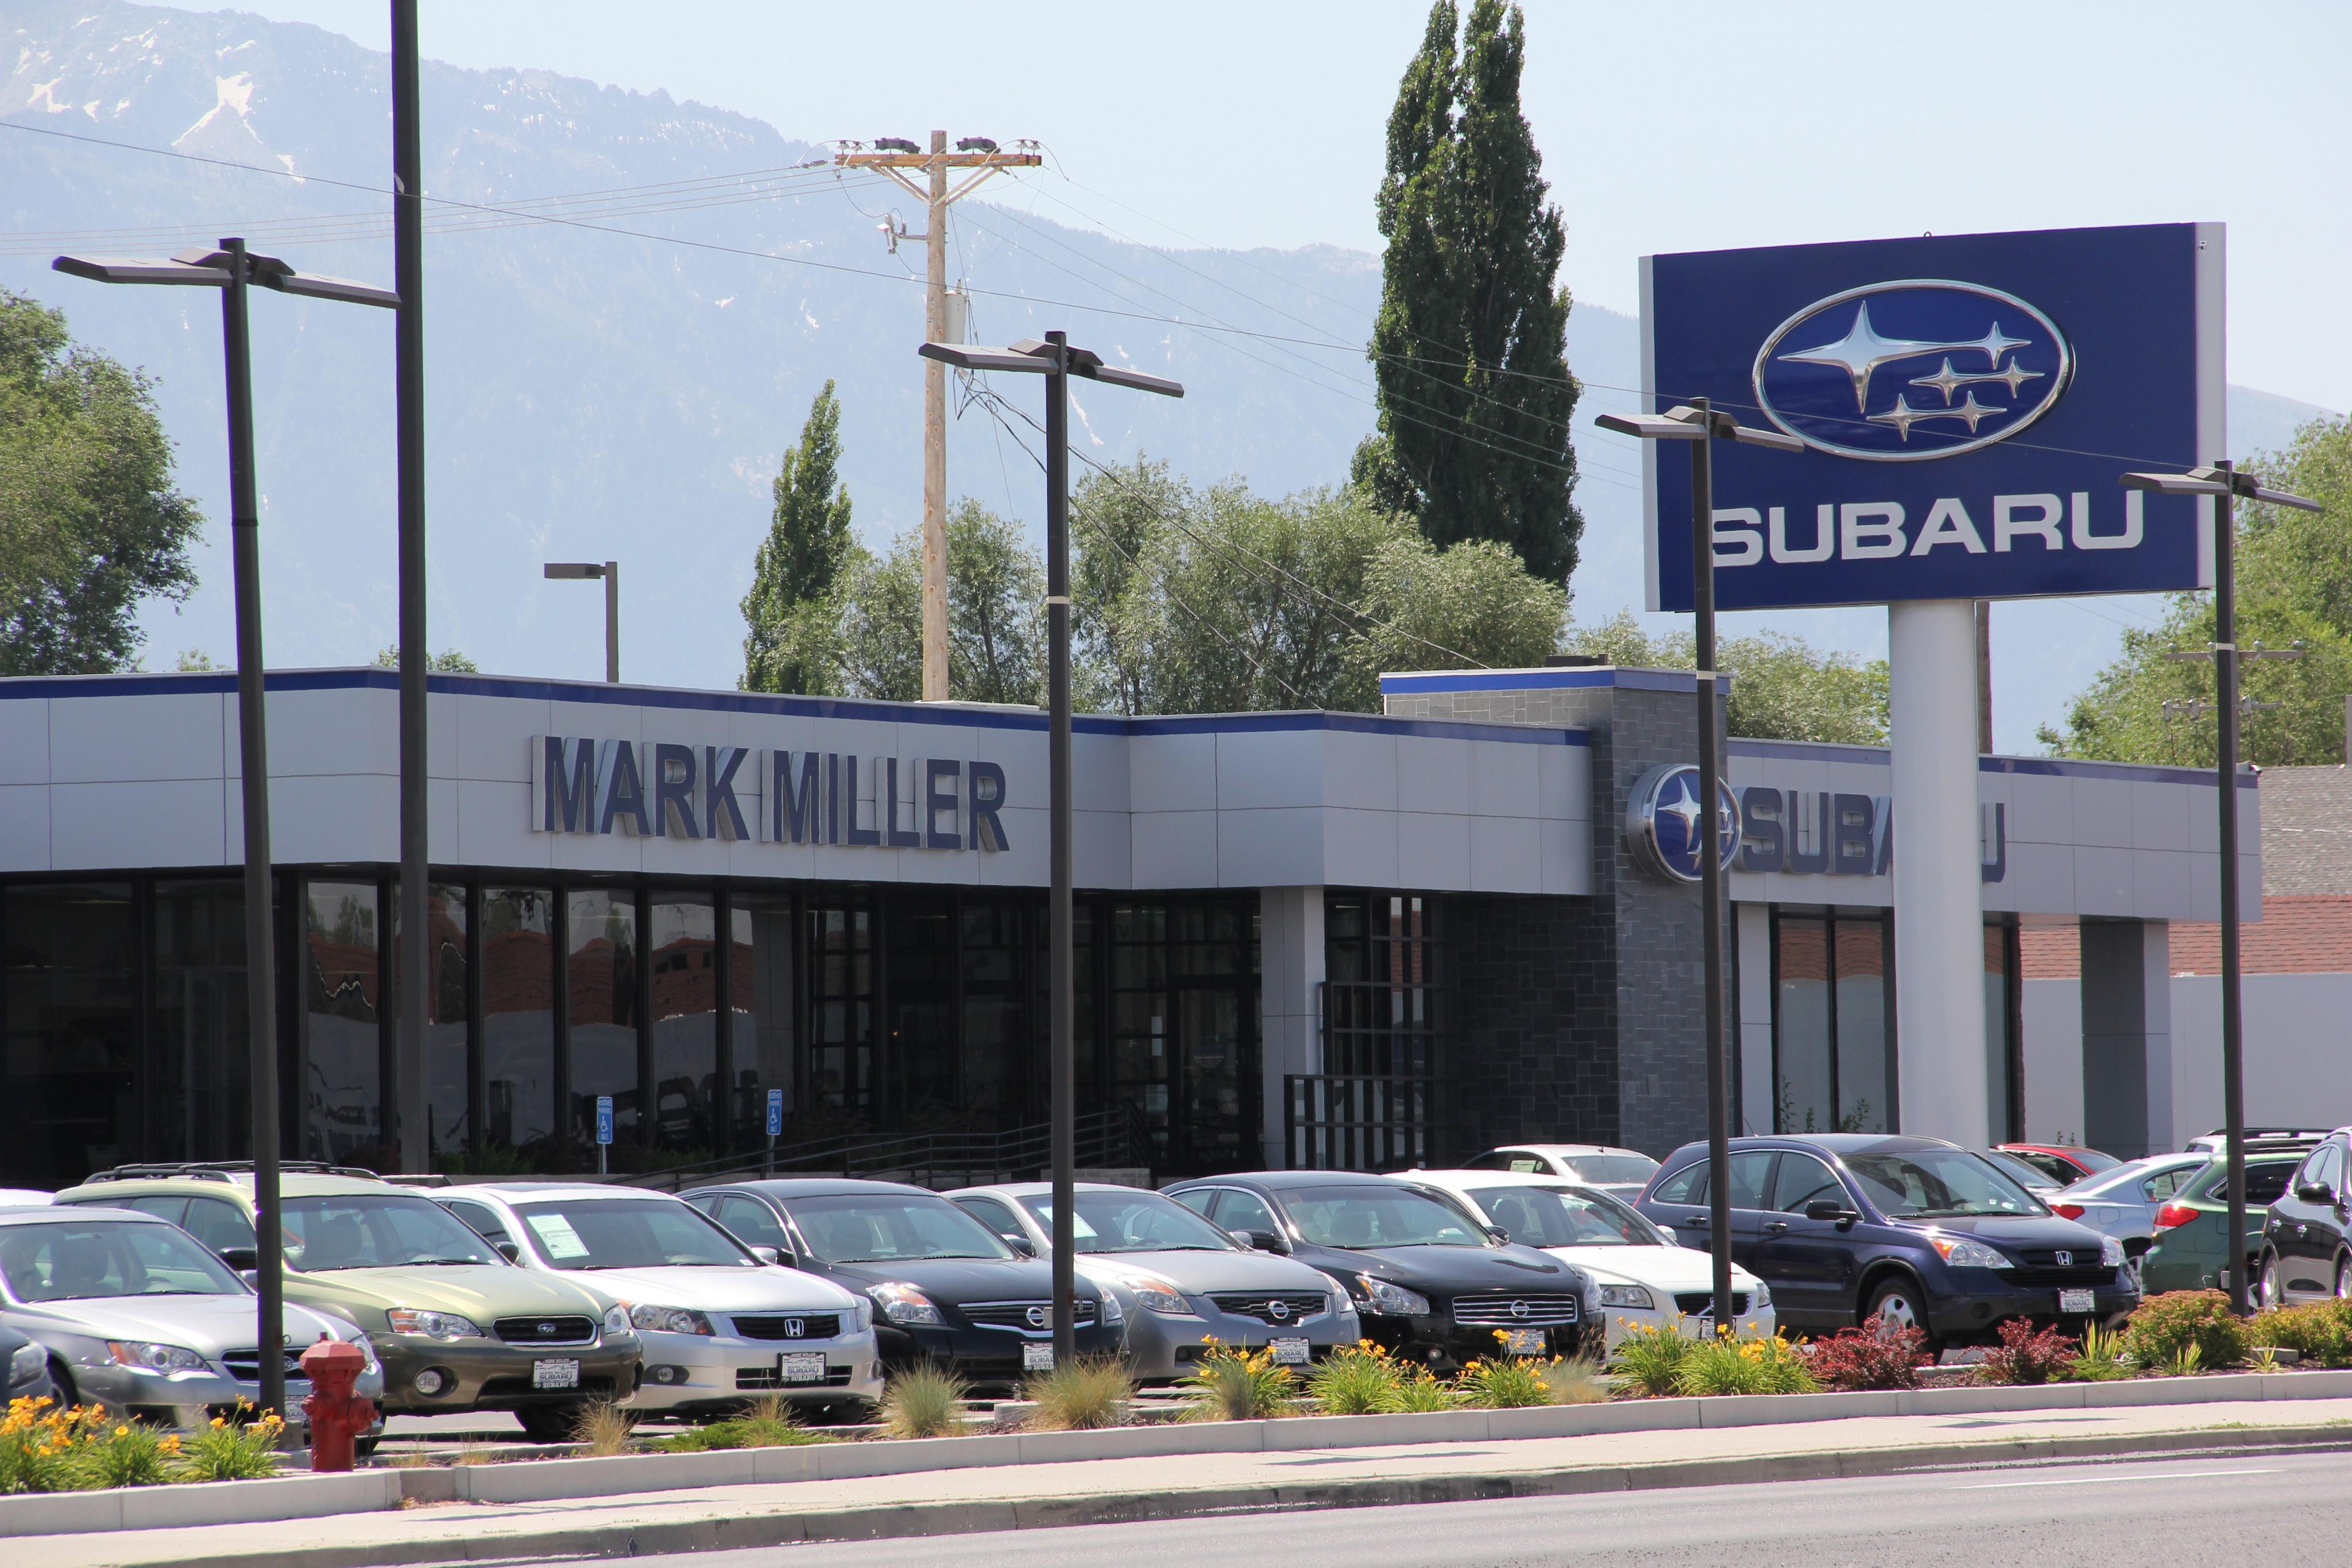 mark miller subaru midtown new subaru dealership in salt lake city ut 84115. Black Bedroom Furniture Sets. Home Design Ideas